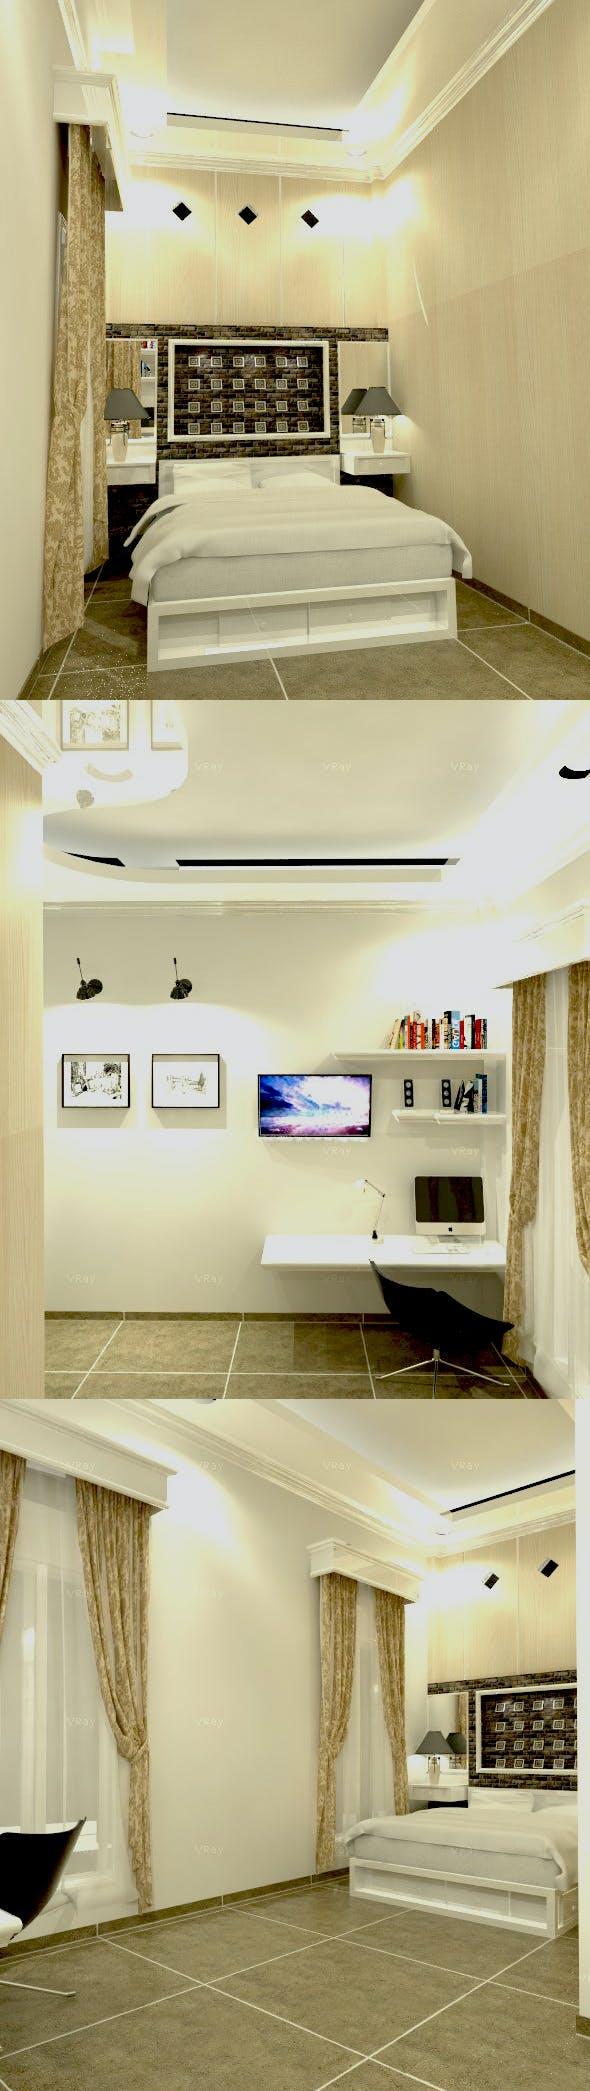 3D BED ROOM INTERIOR DESIGN BALIKPAPAN REG 1 - 3DOcean Item for Sale